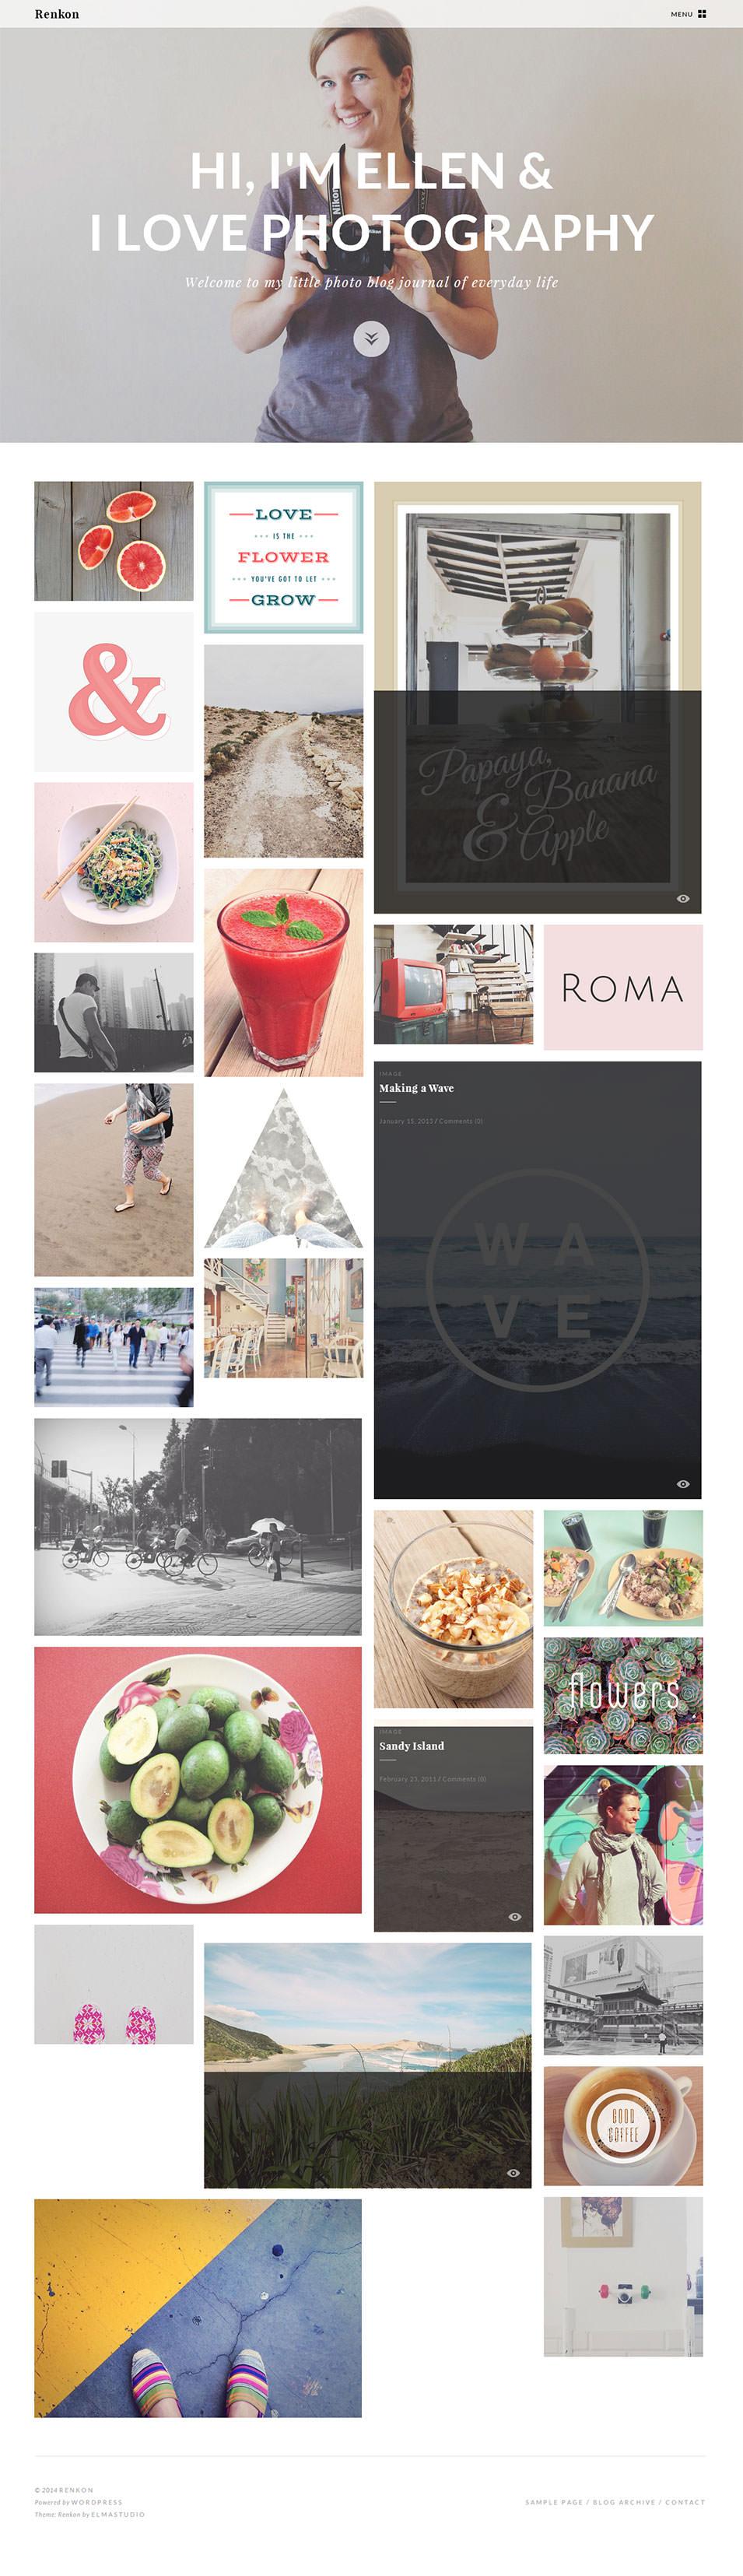 renkon premium photo blog theme by elmastudio